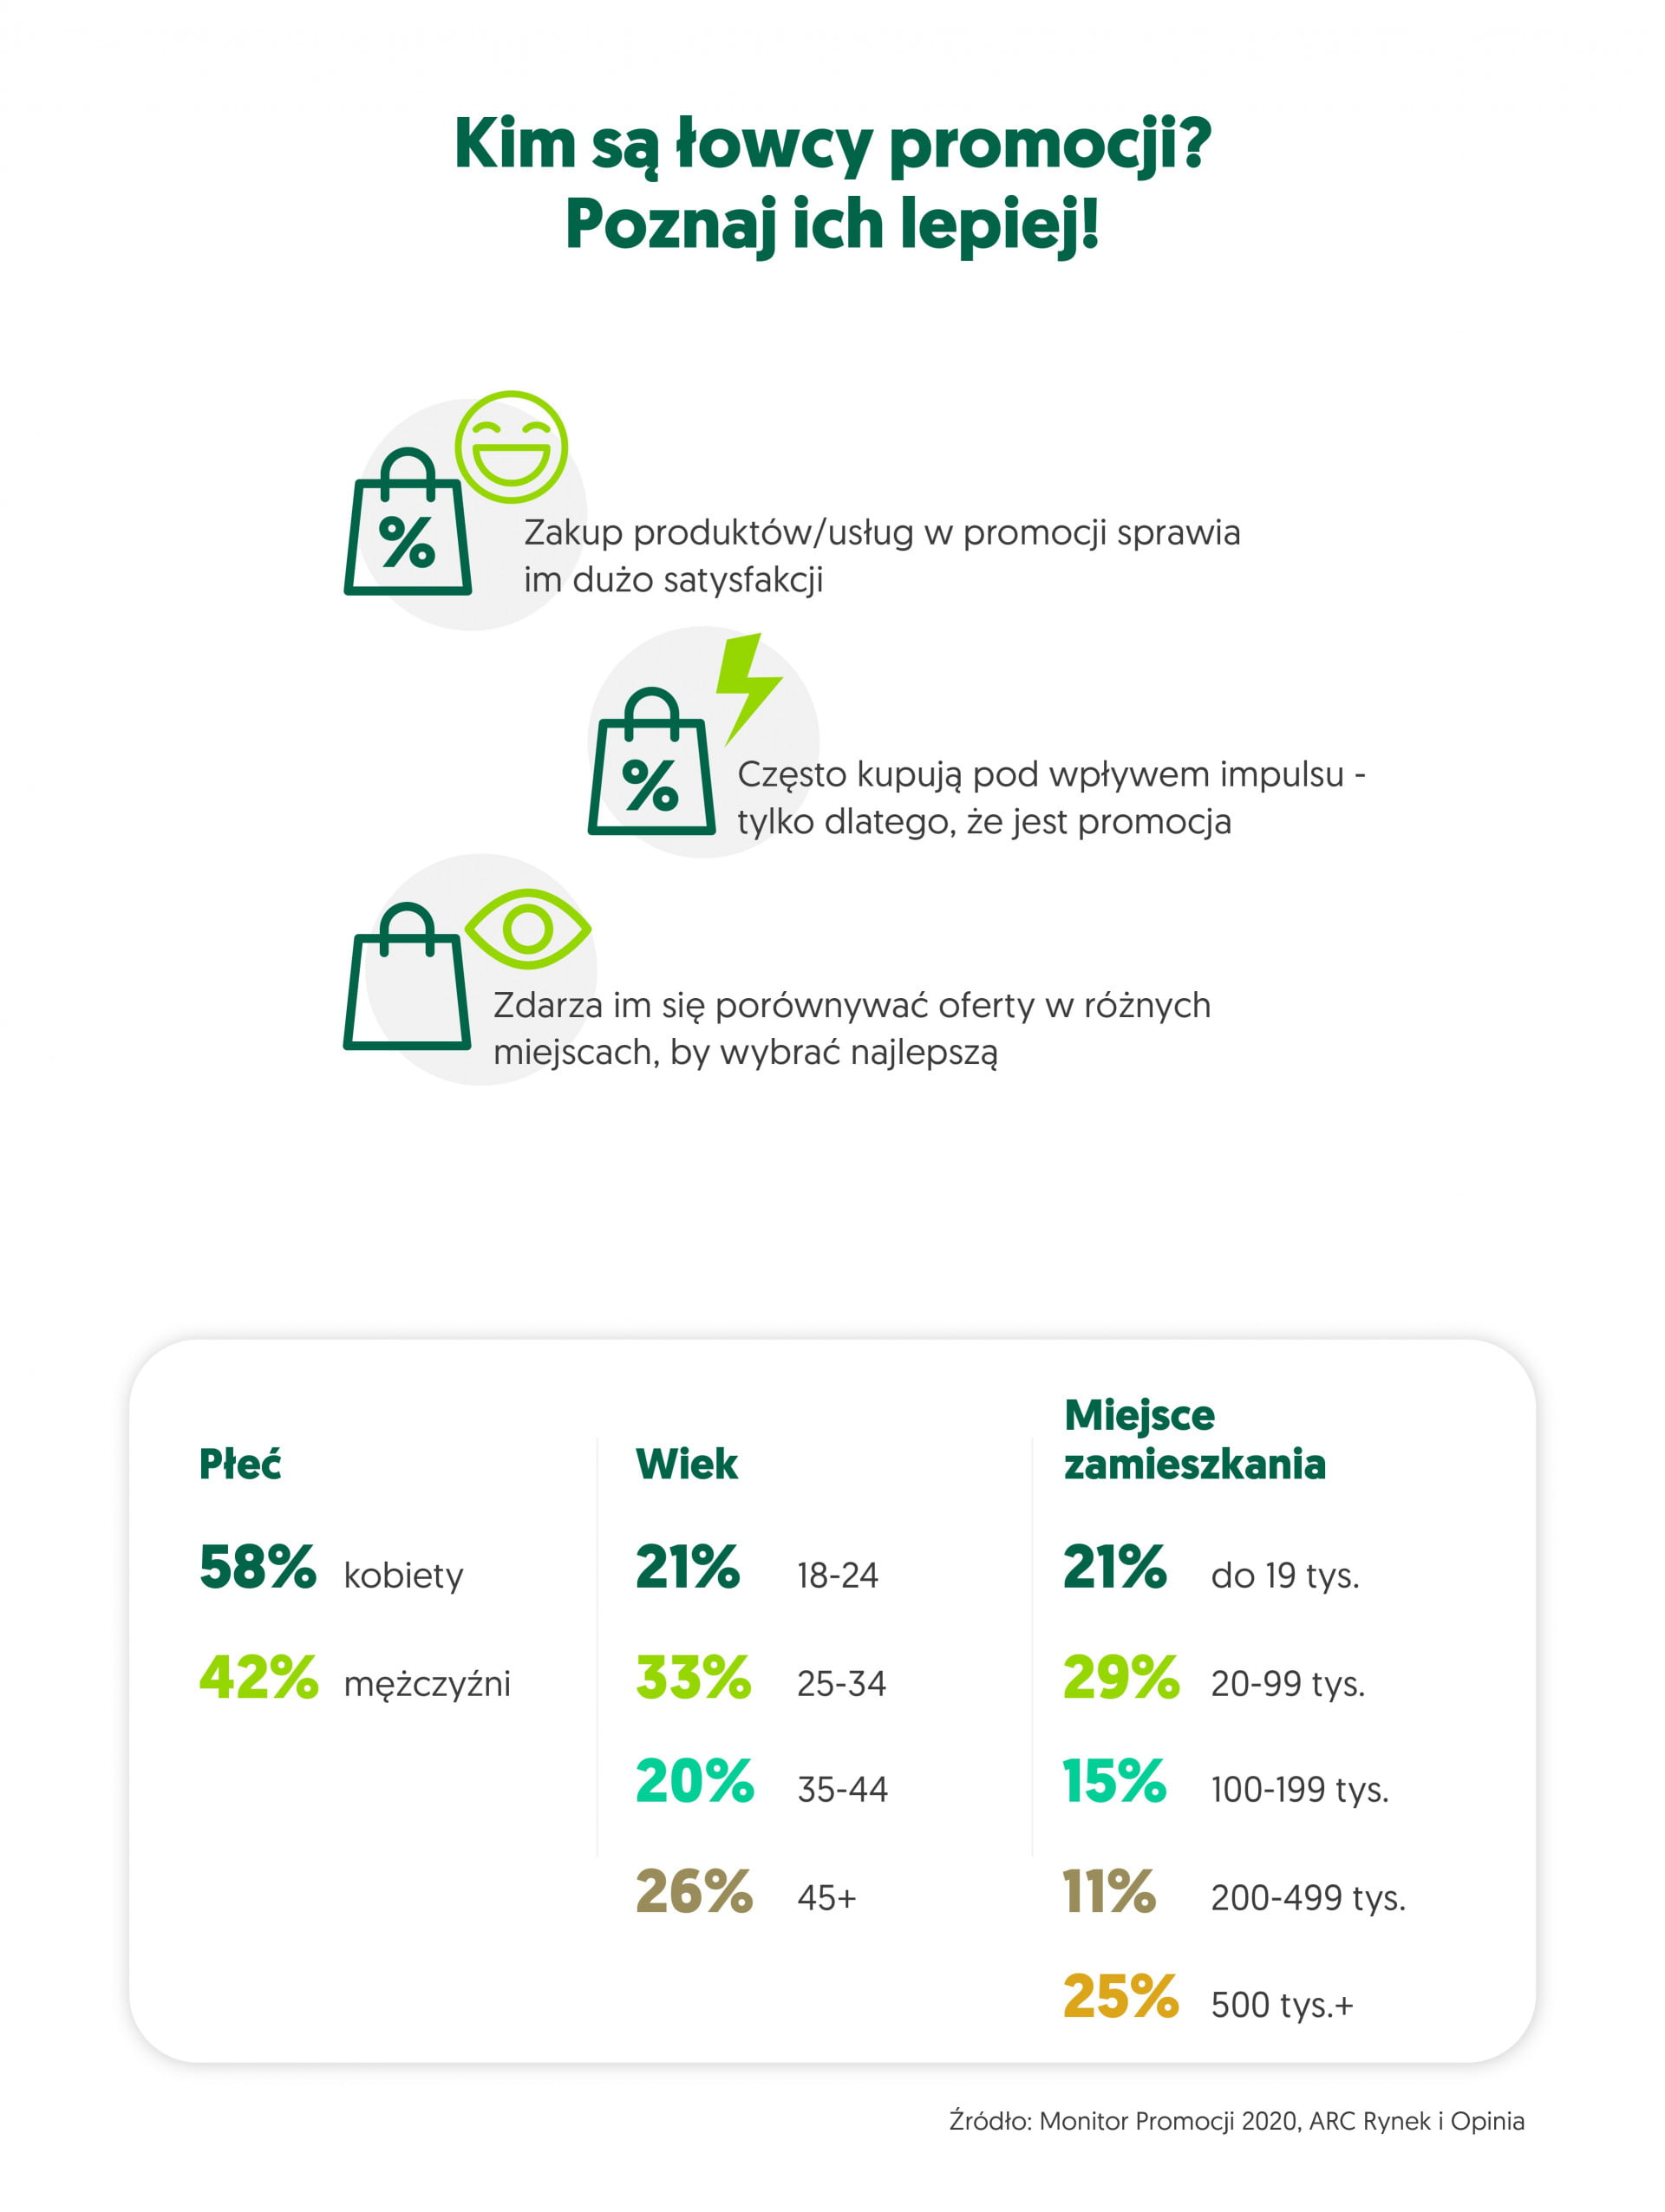 atrakcyjne promocje - infografika 2